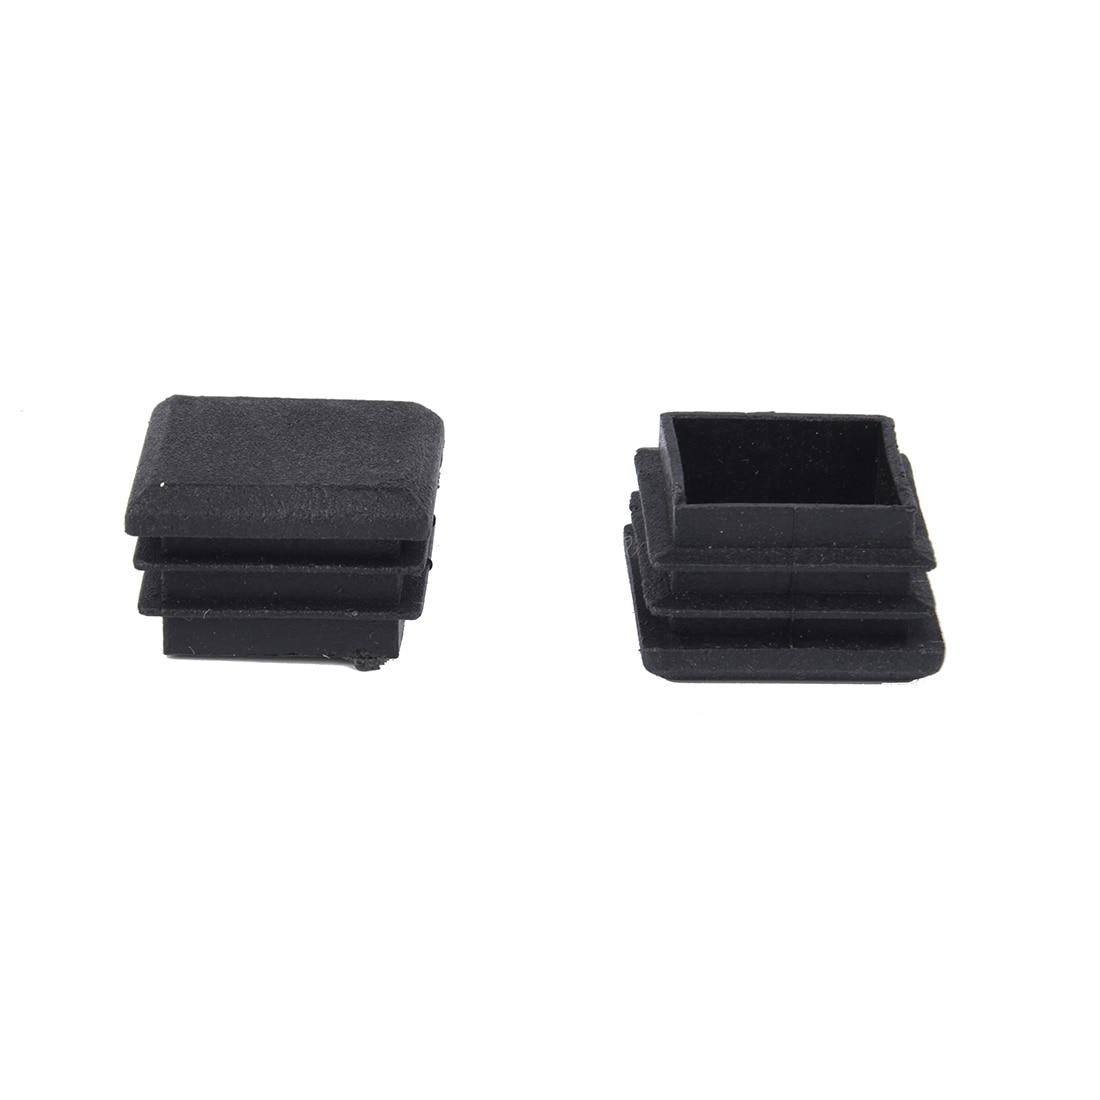 Nhbr 10 Pcs Black Plastic Square Tube Inserts End Blanking Cap 25mm X 25mm Furniture